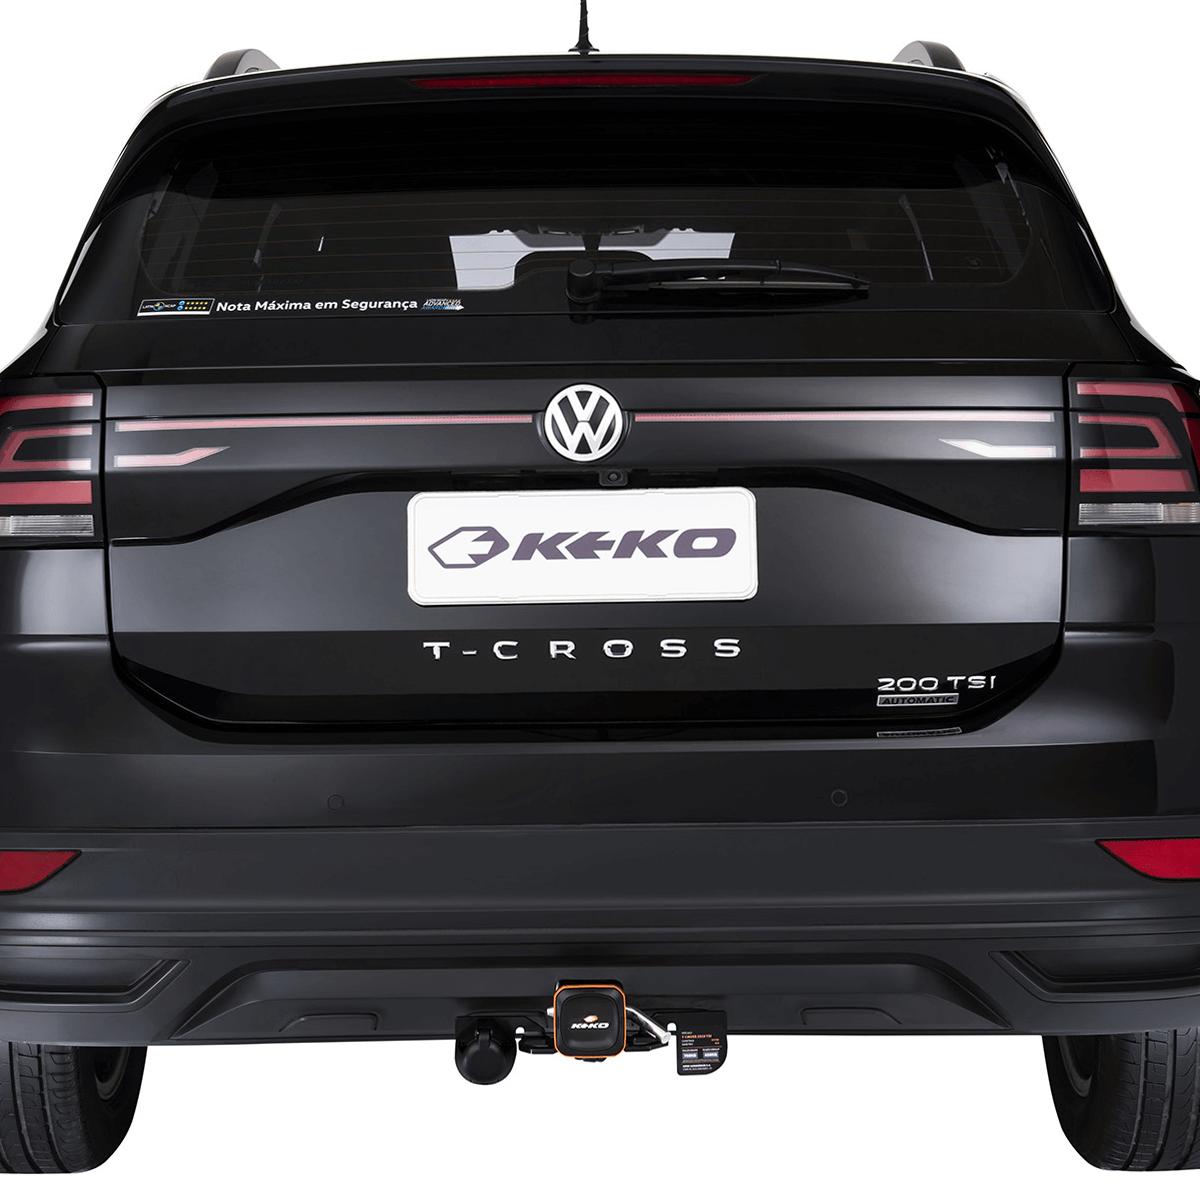 Engate de reboque T-Cross 2020 Keko K1 removível 750 kg